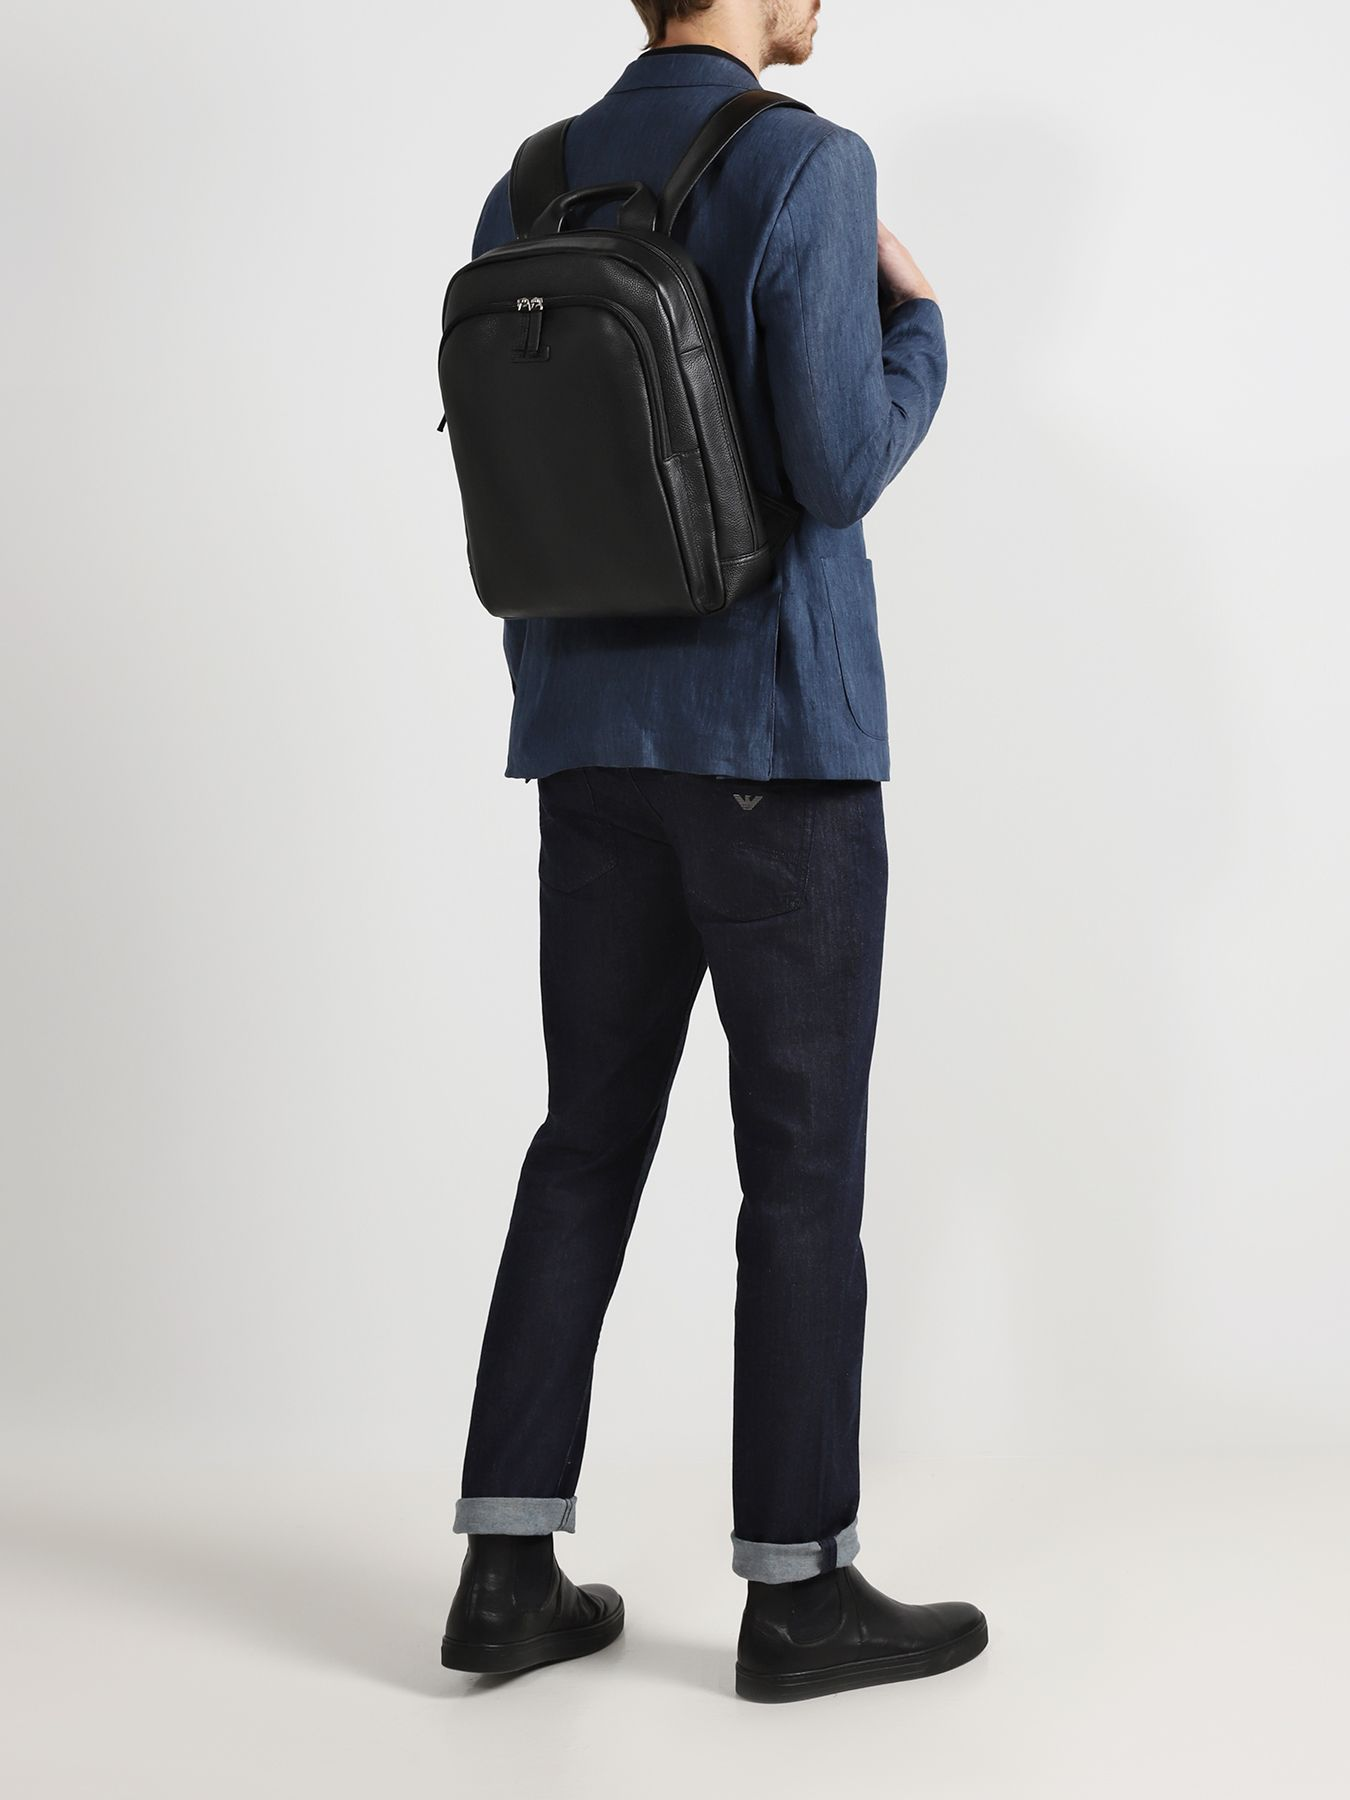 Рюкзак Ritter Мужской рюкзак рюкзак мужской vibe outca1813vi blu2